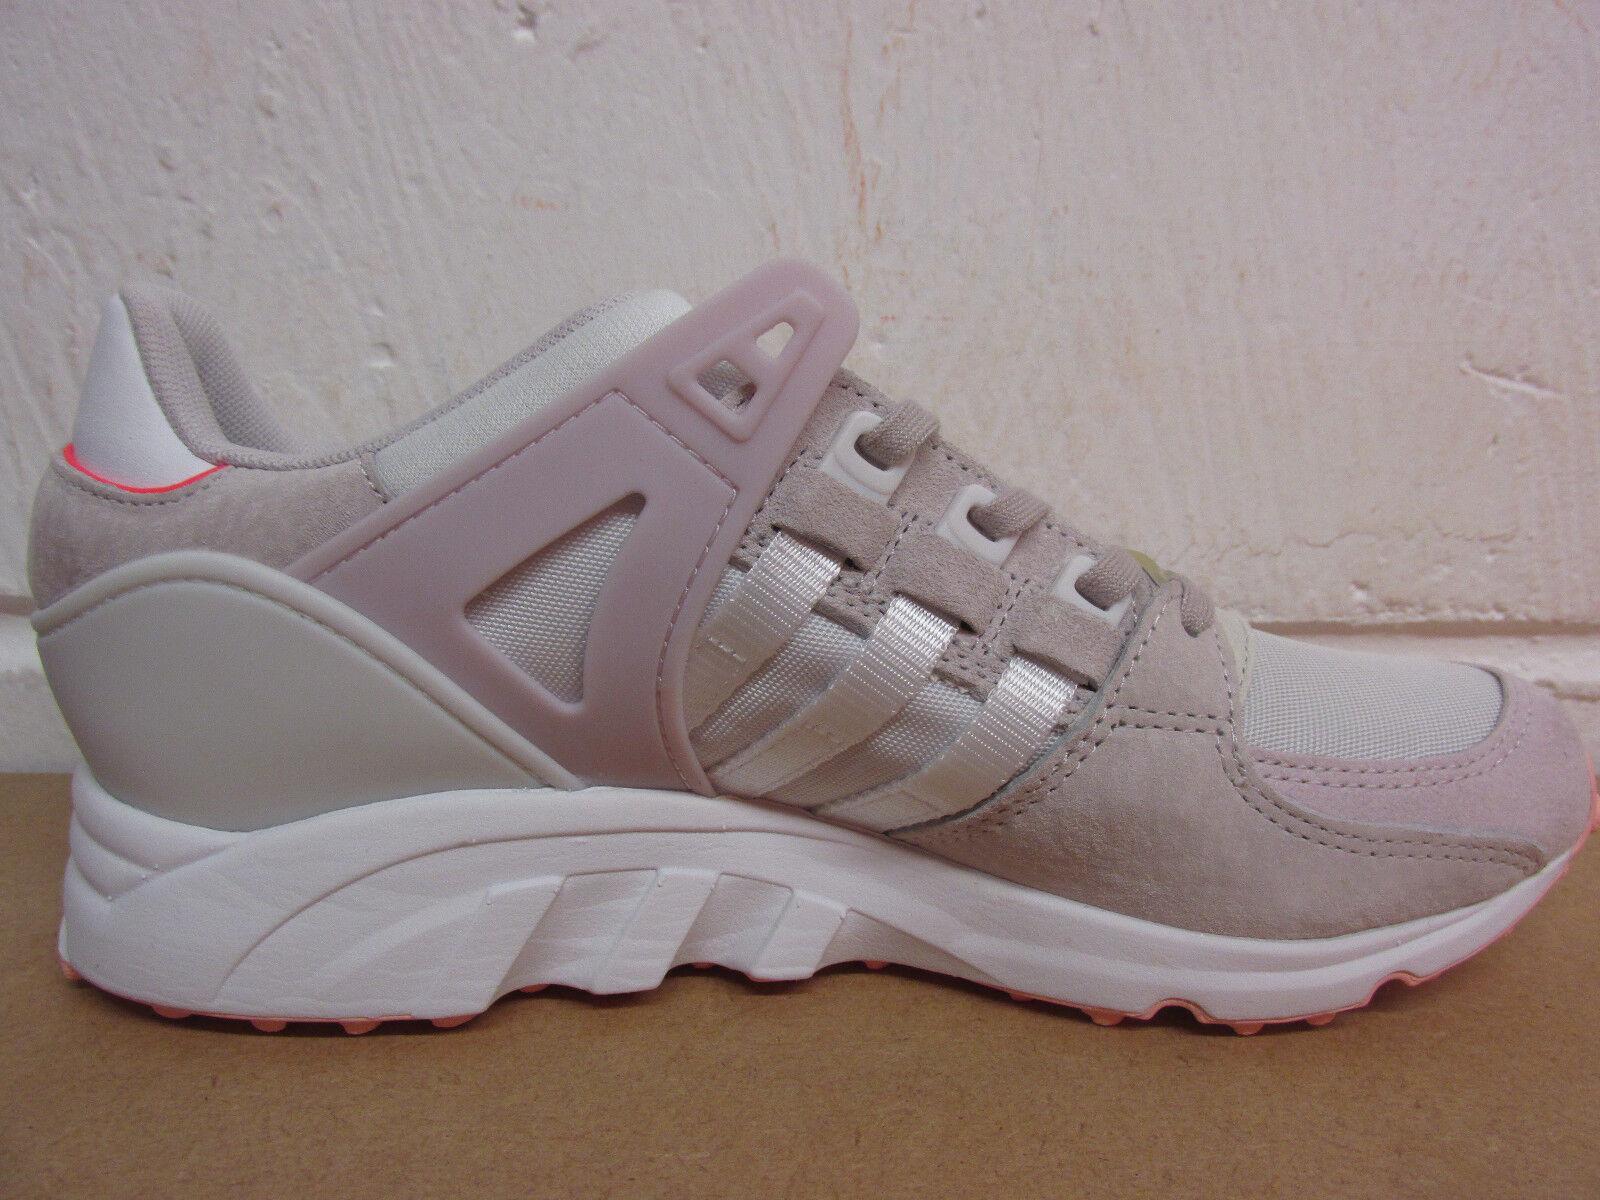 adidas originaux eqt eqt originaux appuyer des femmes formateurs bb2356 baskets courant rf 1ed331